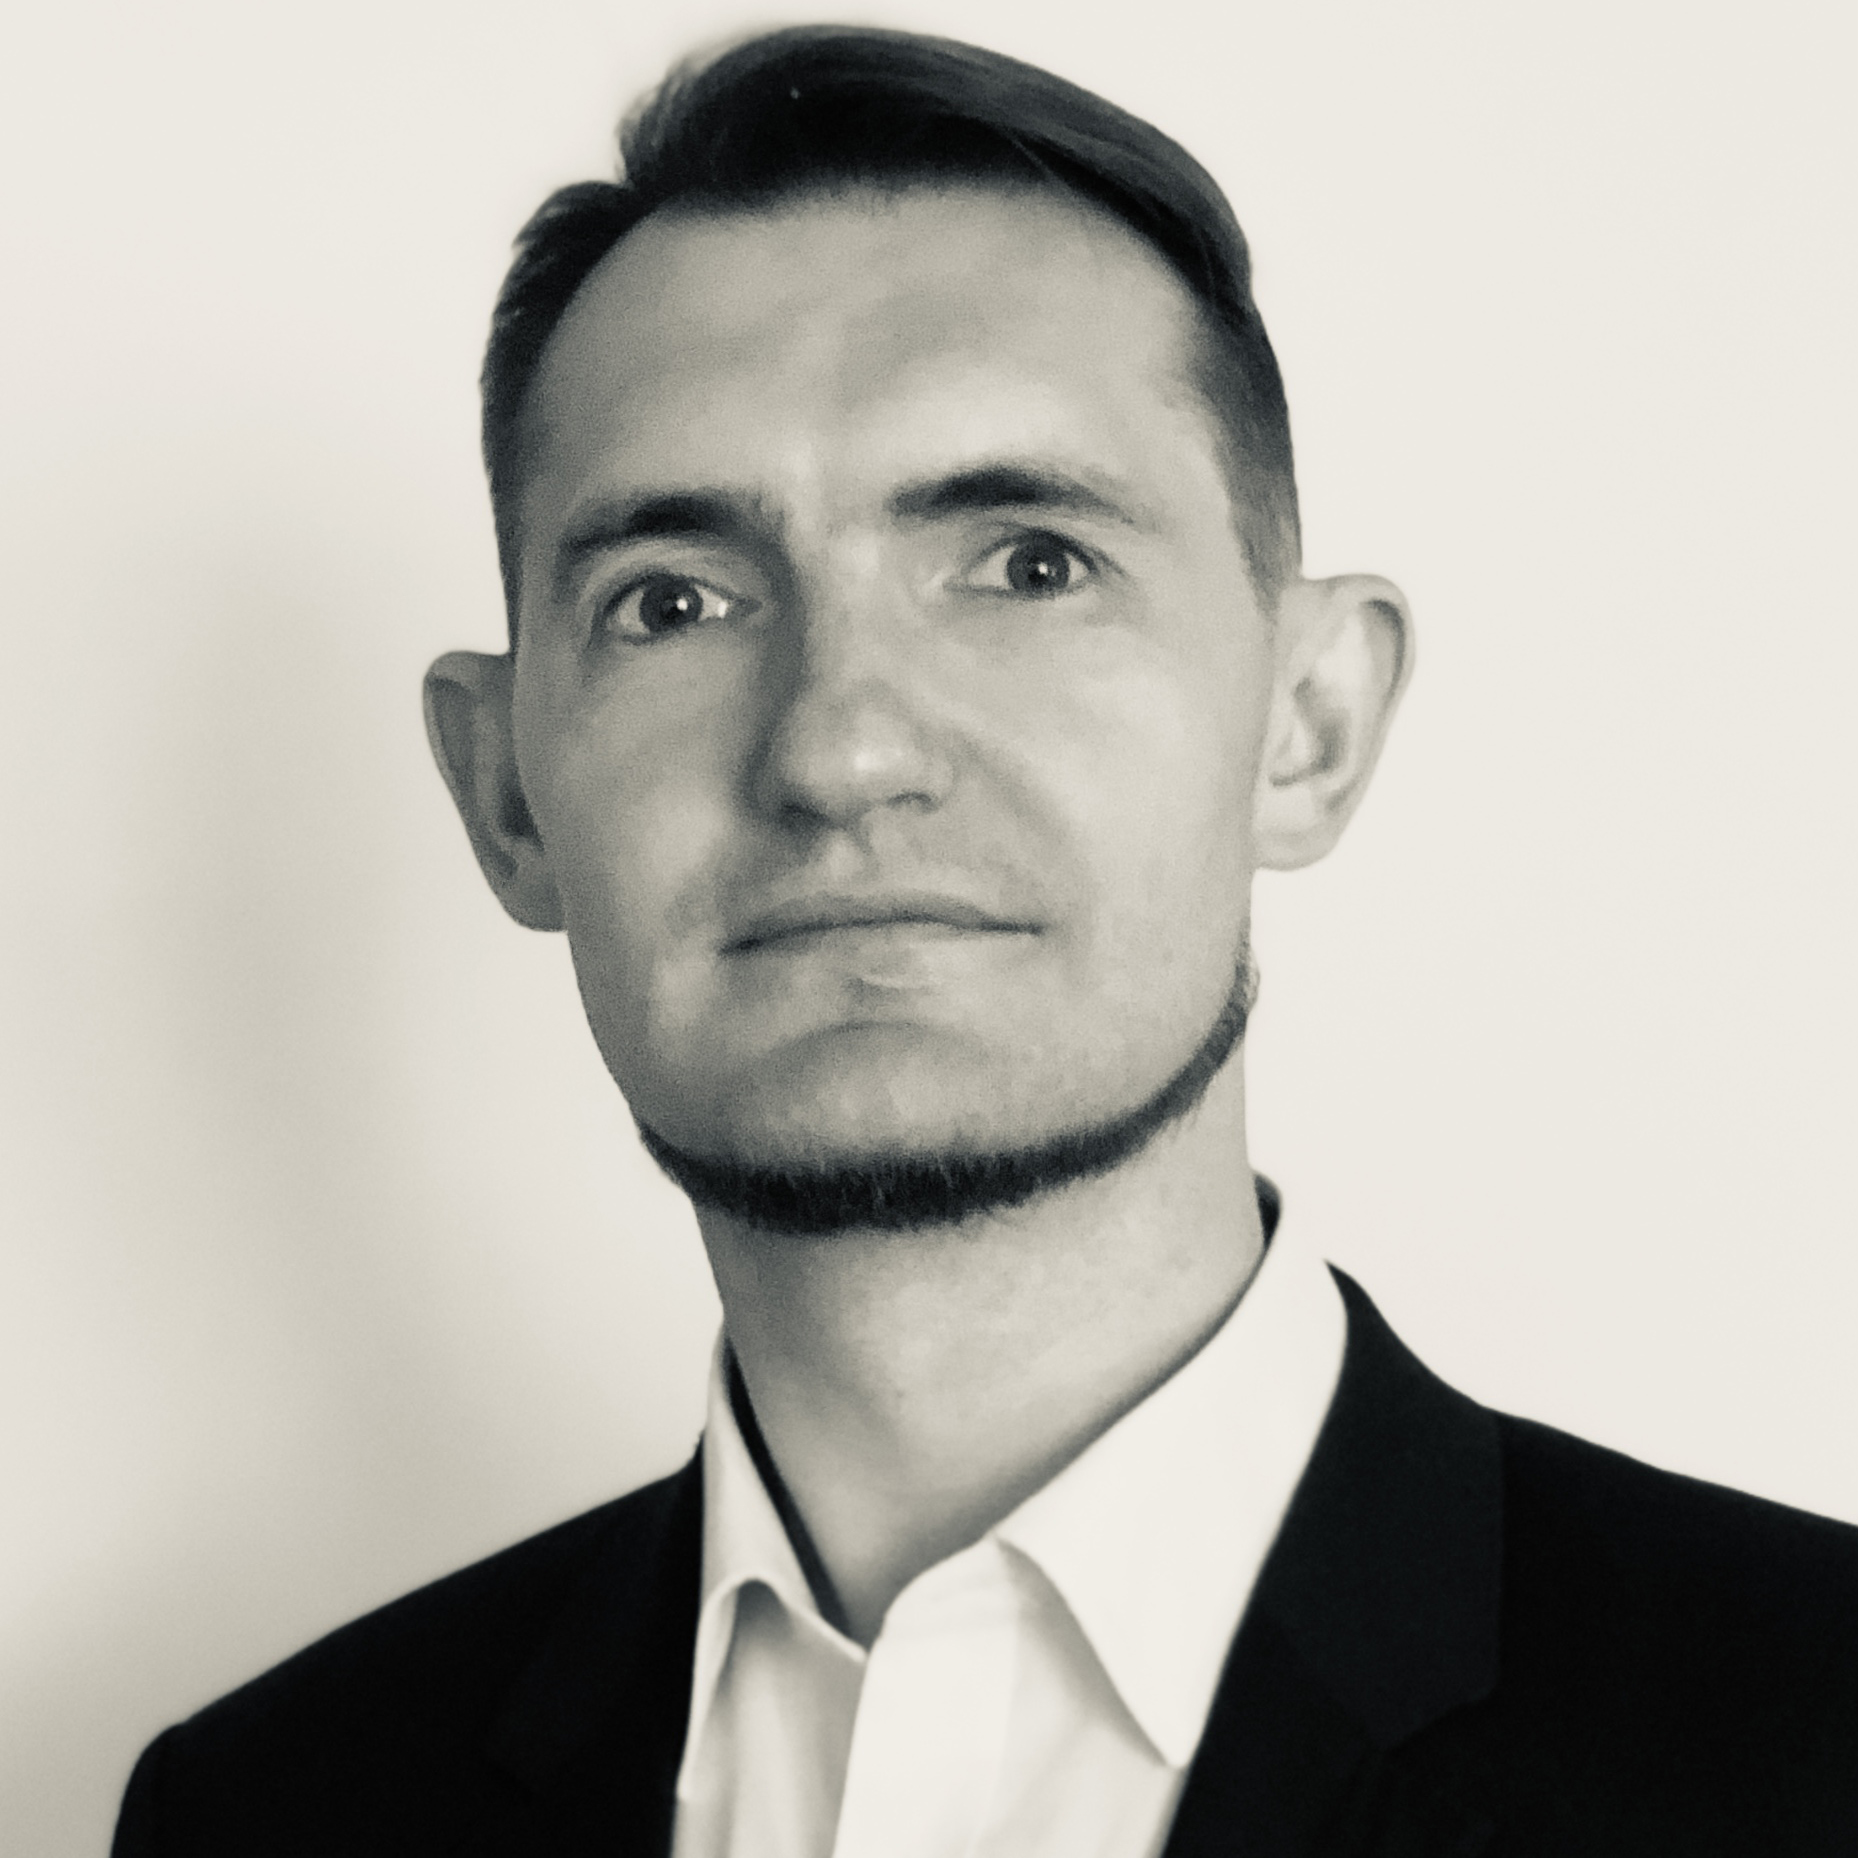 Юрій Гуменчук